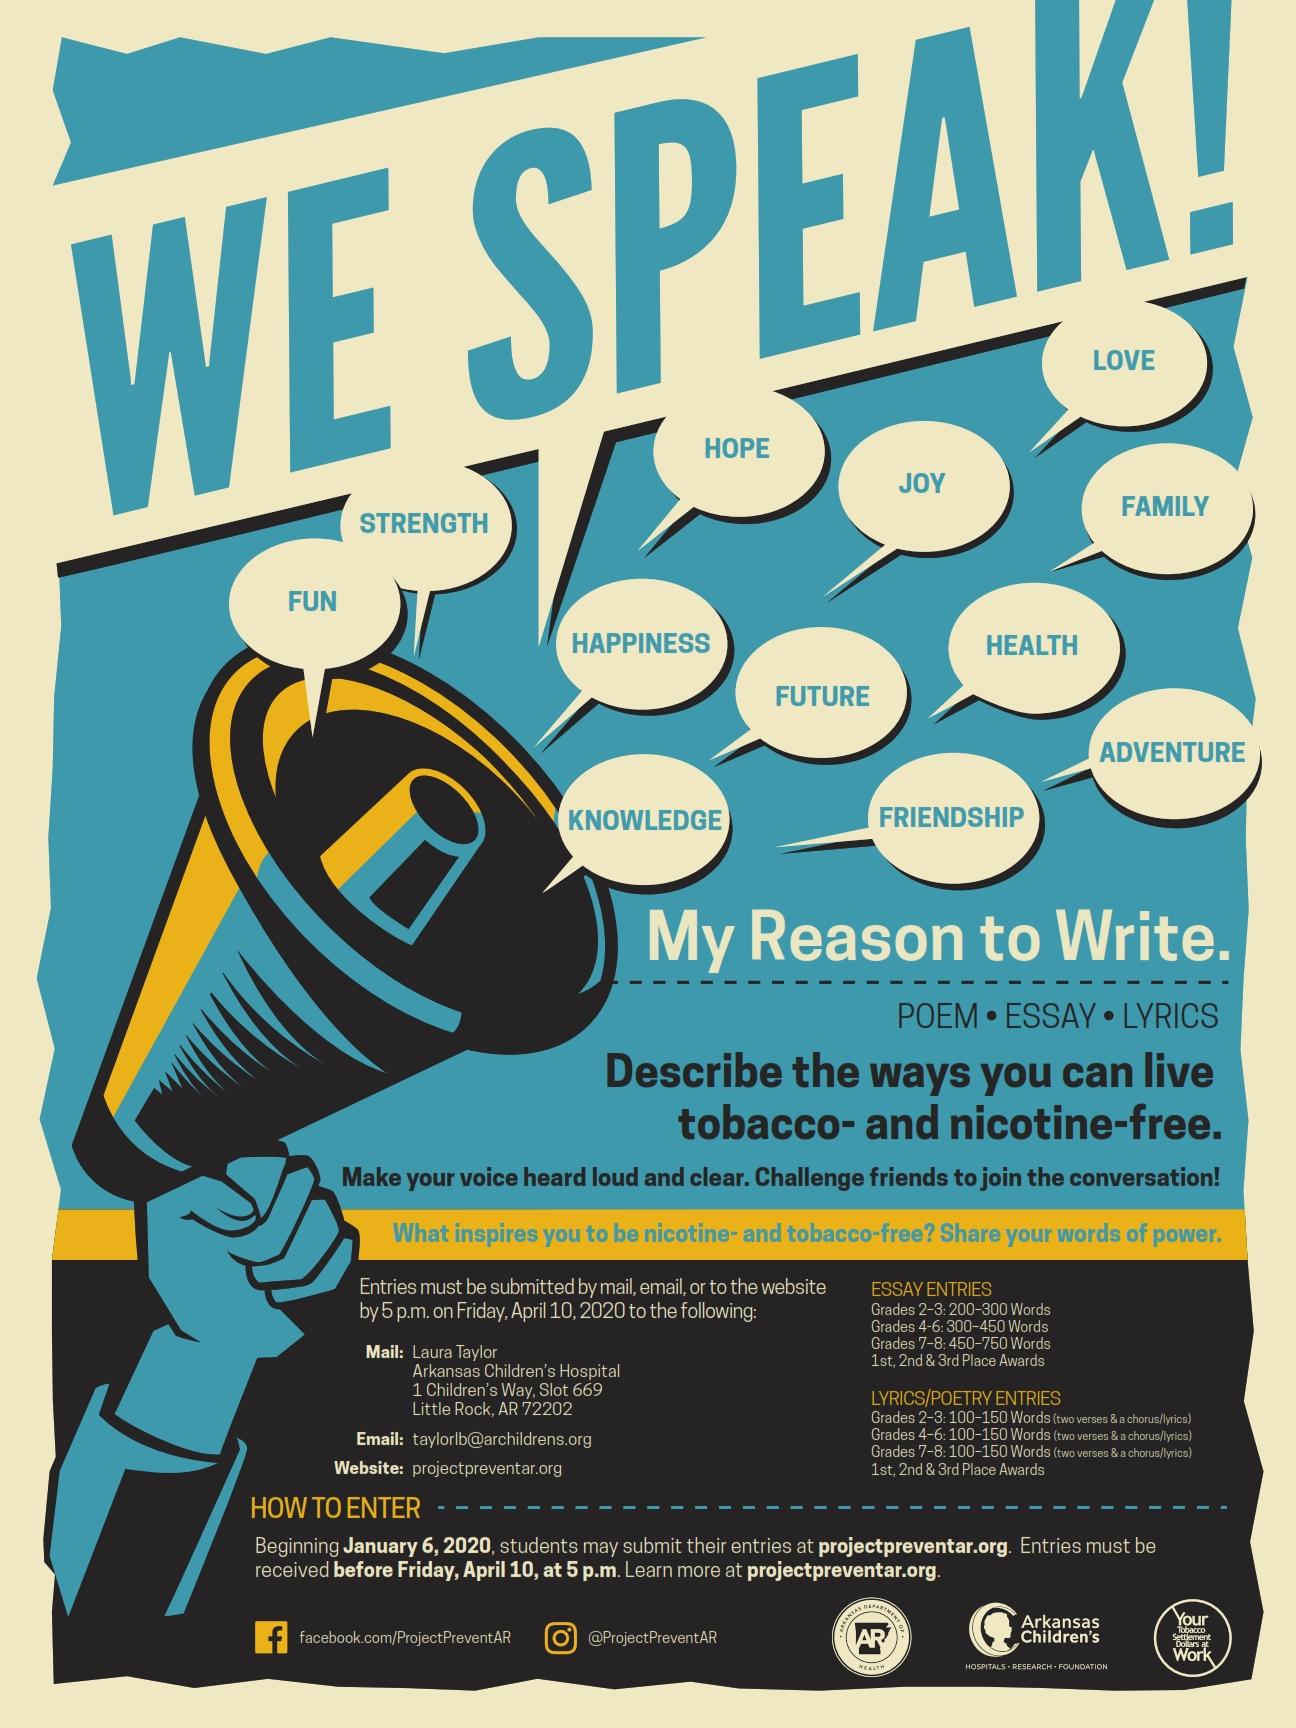 WE SPEAK! My Reason to Write contest poster